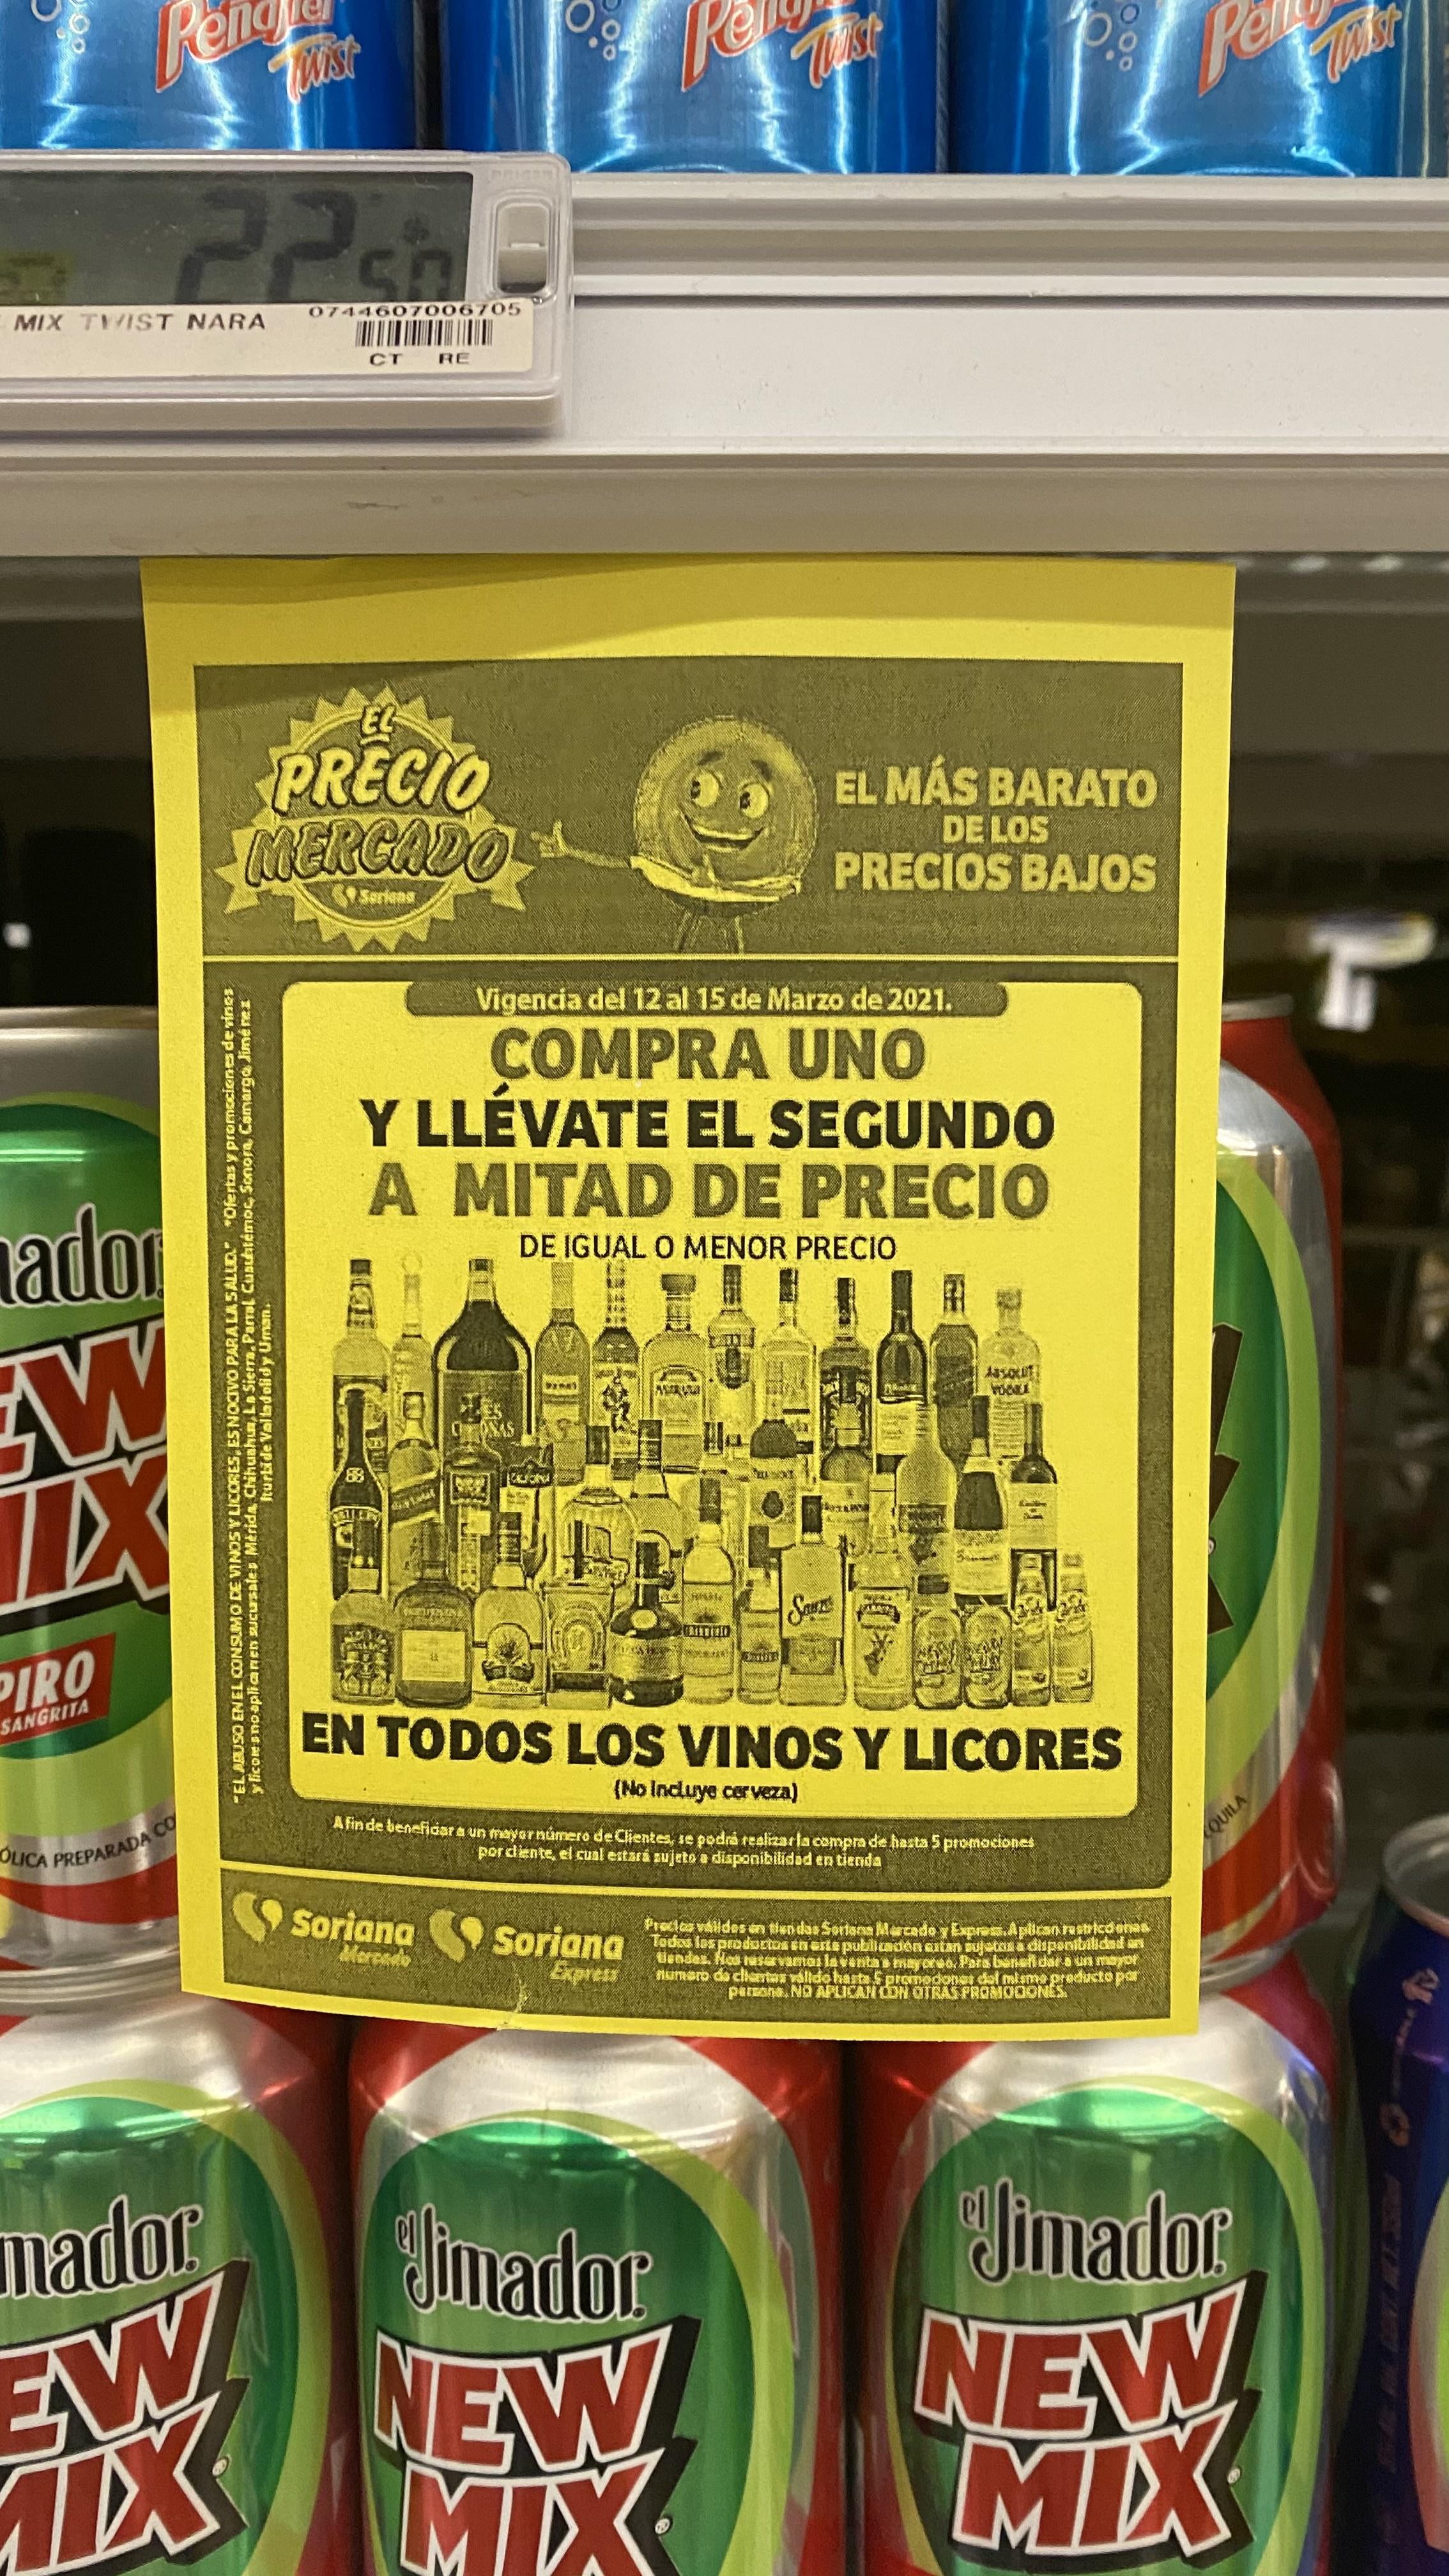 Soriana: Segunda botella de alcohol o vino a mitad de precio